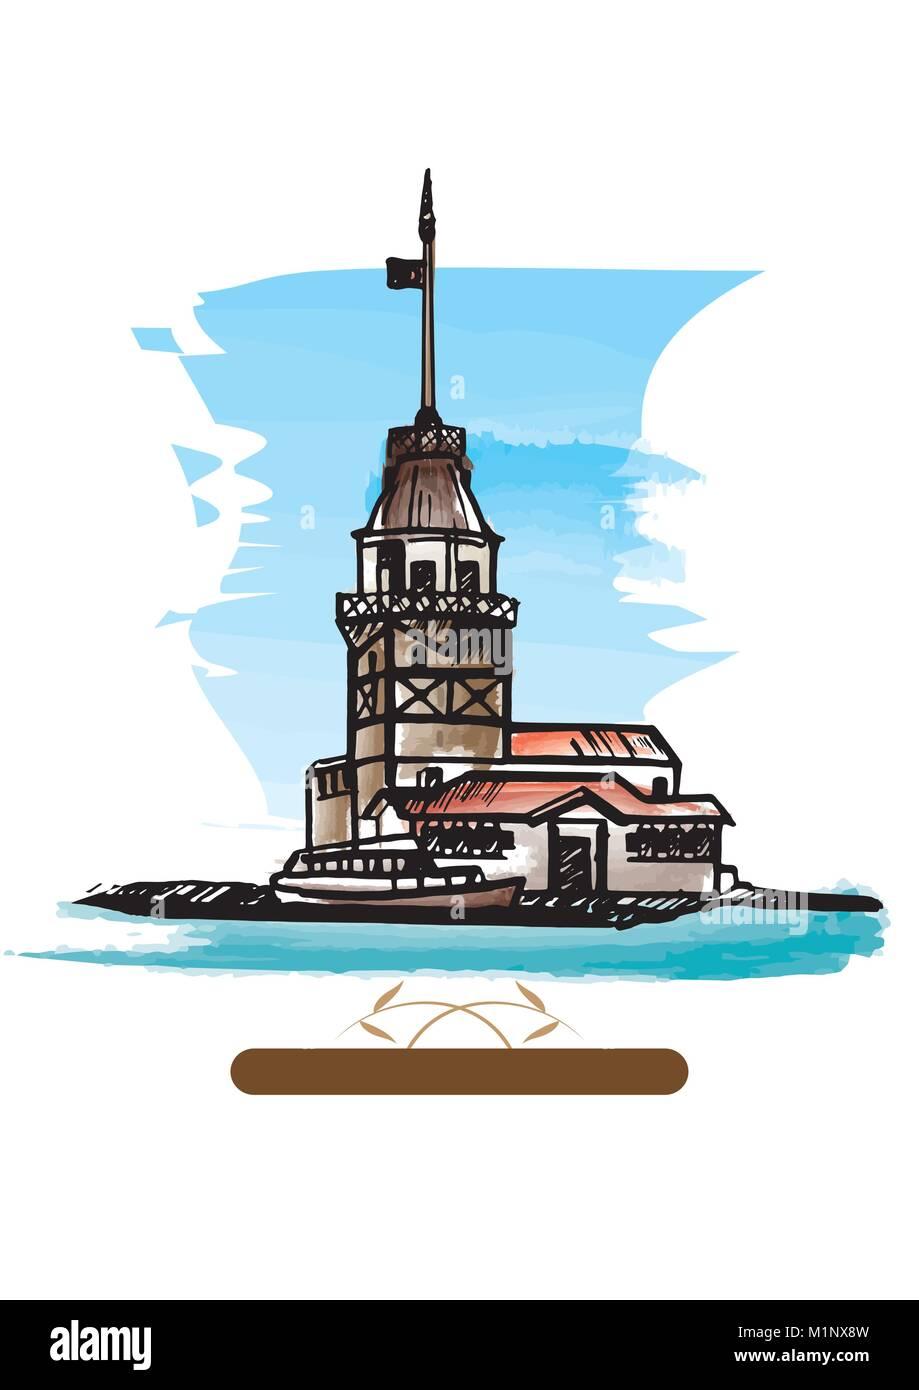 The Maiden's Tower (Kiz Kulesi). Hand drawn vector illustration. - Stock Image